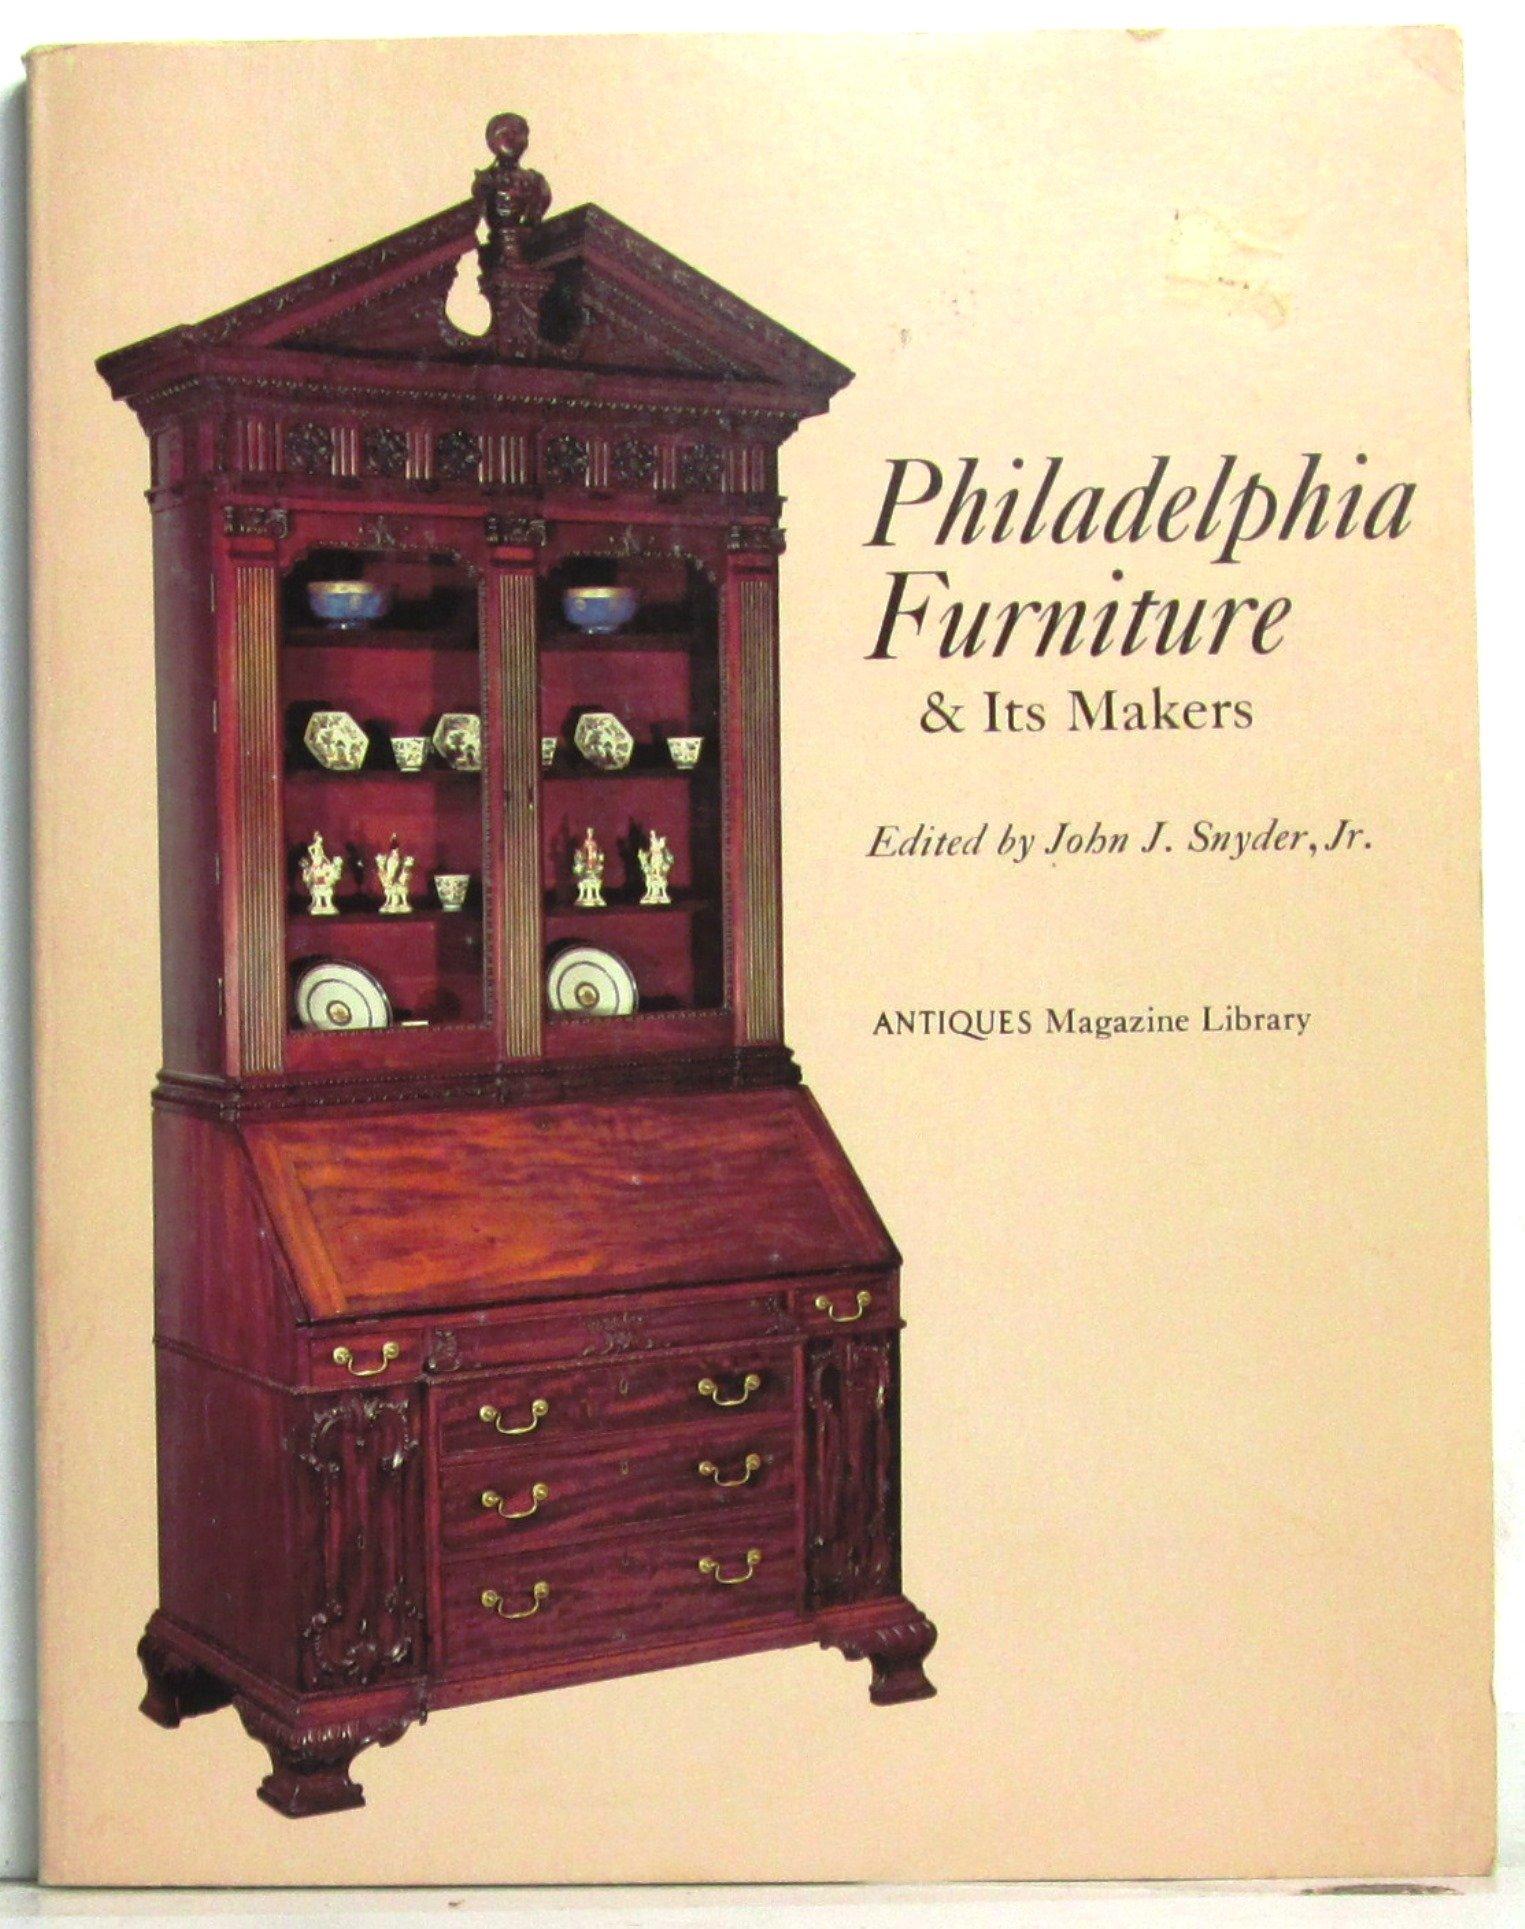 Philadelphia furniture & its makers (Antiques magazine library): Jr. John  J. Snyder: 9780876639214: Amazon.com: Books - Philadelphia Furniture & Its Makers (Antiques Magazine Library): Jr